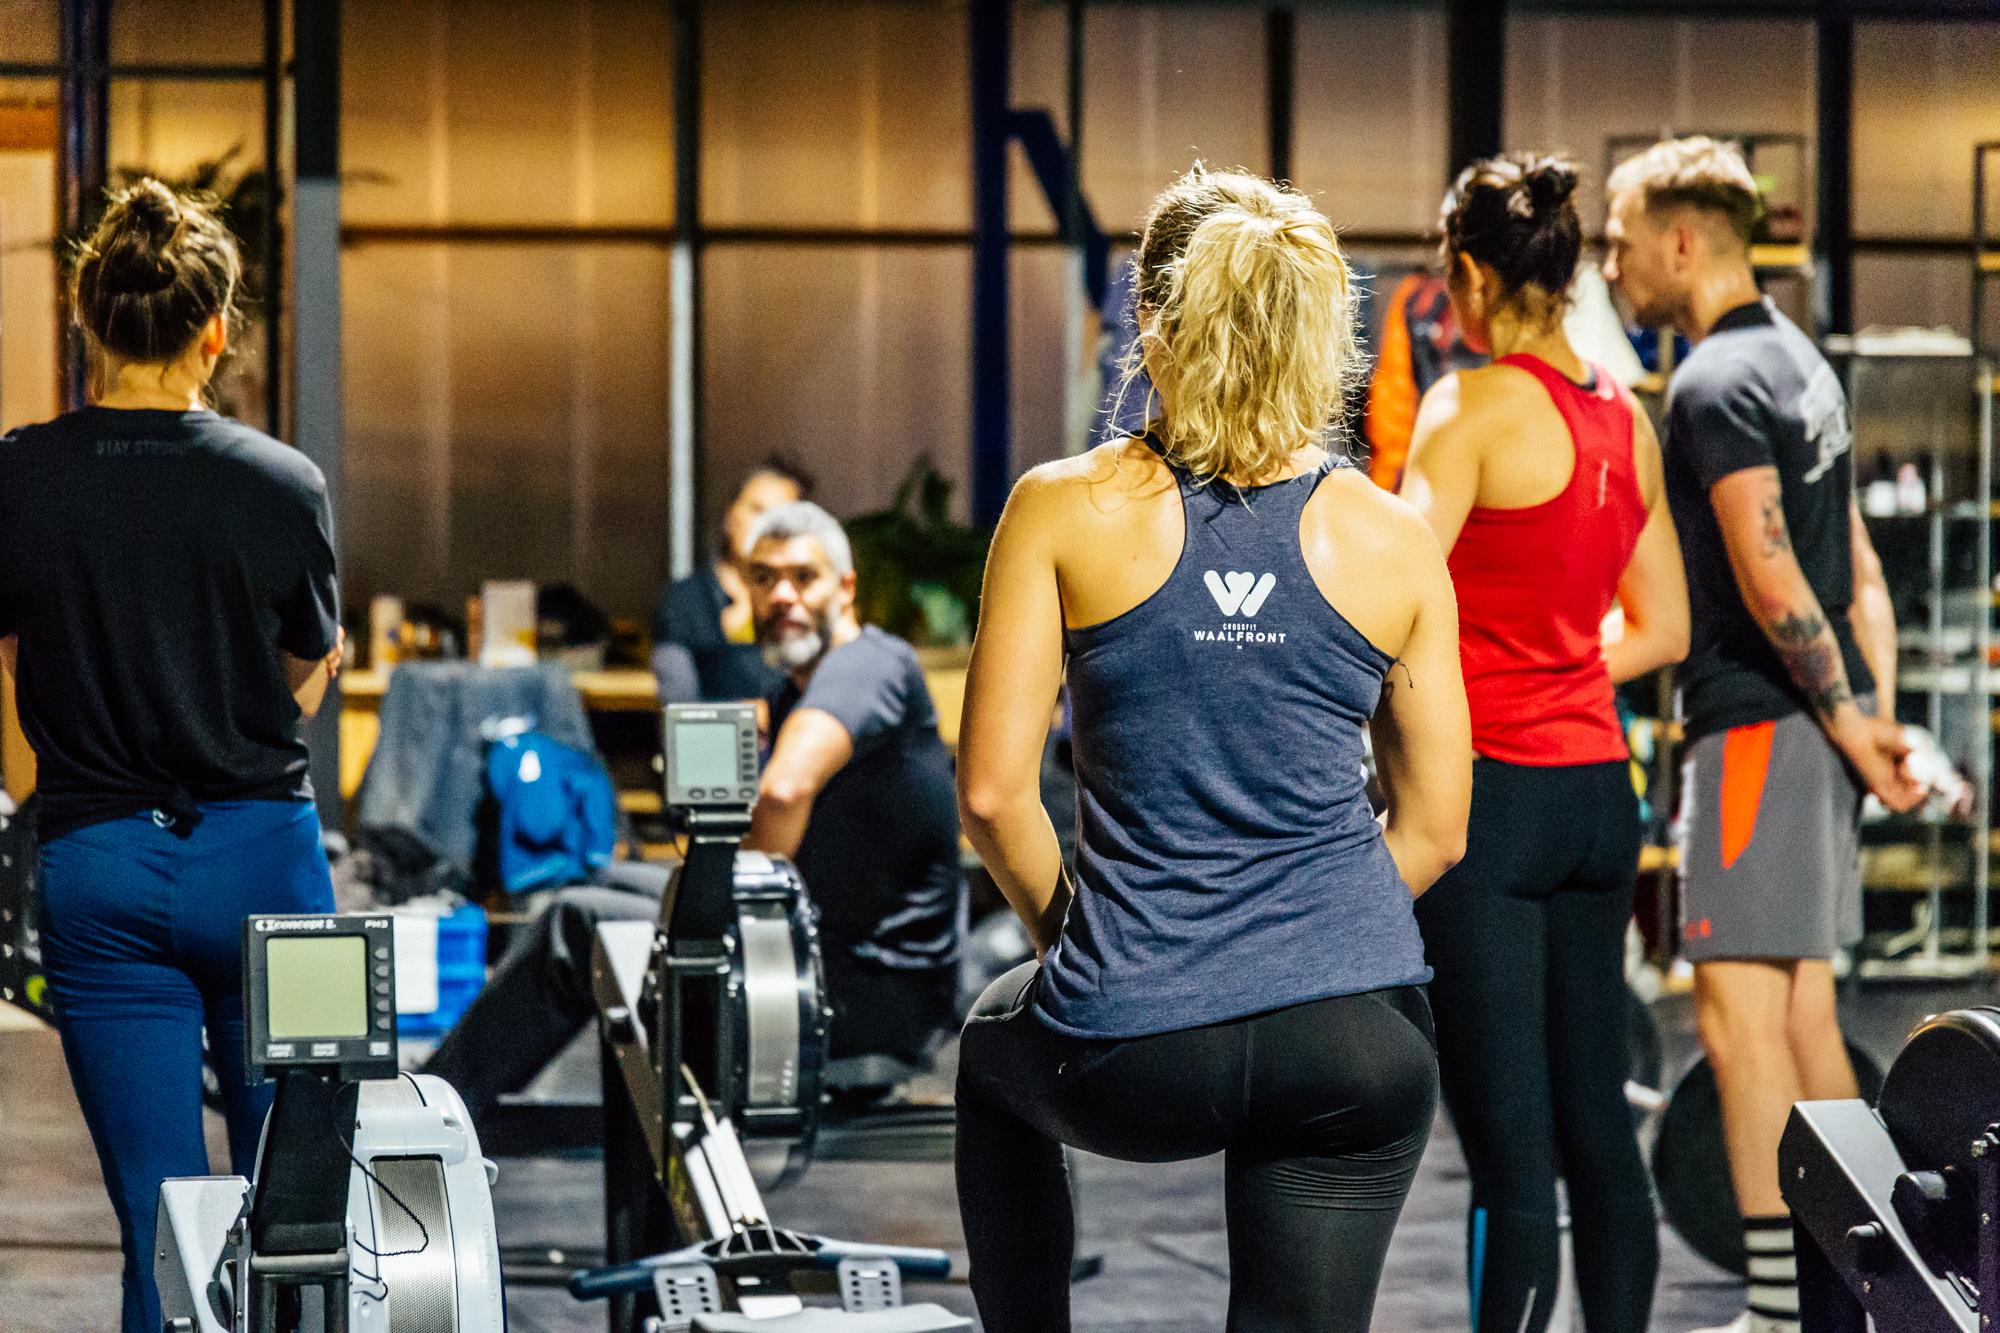 Crossfit Waalfront takes advantage of the Wattz class by RoBox Fitness